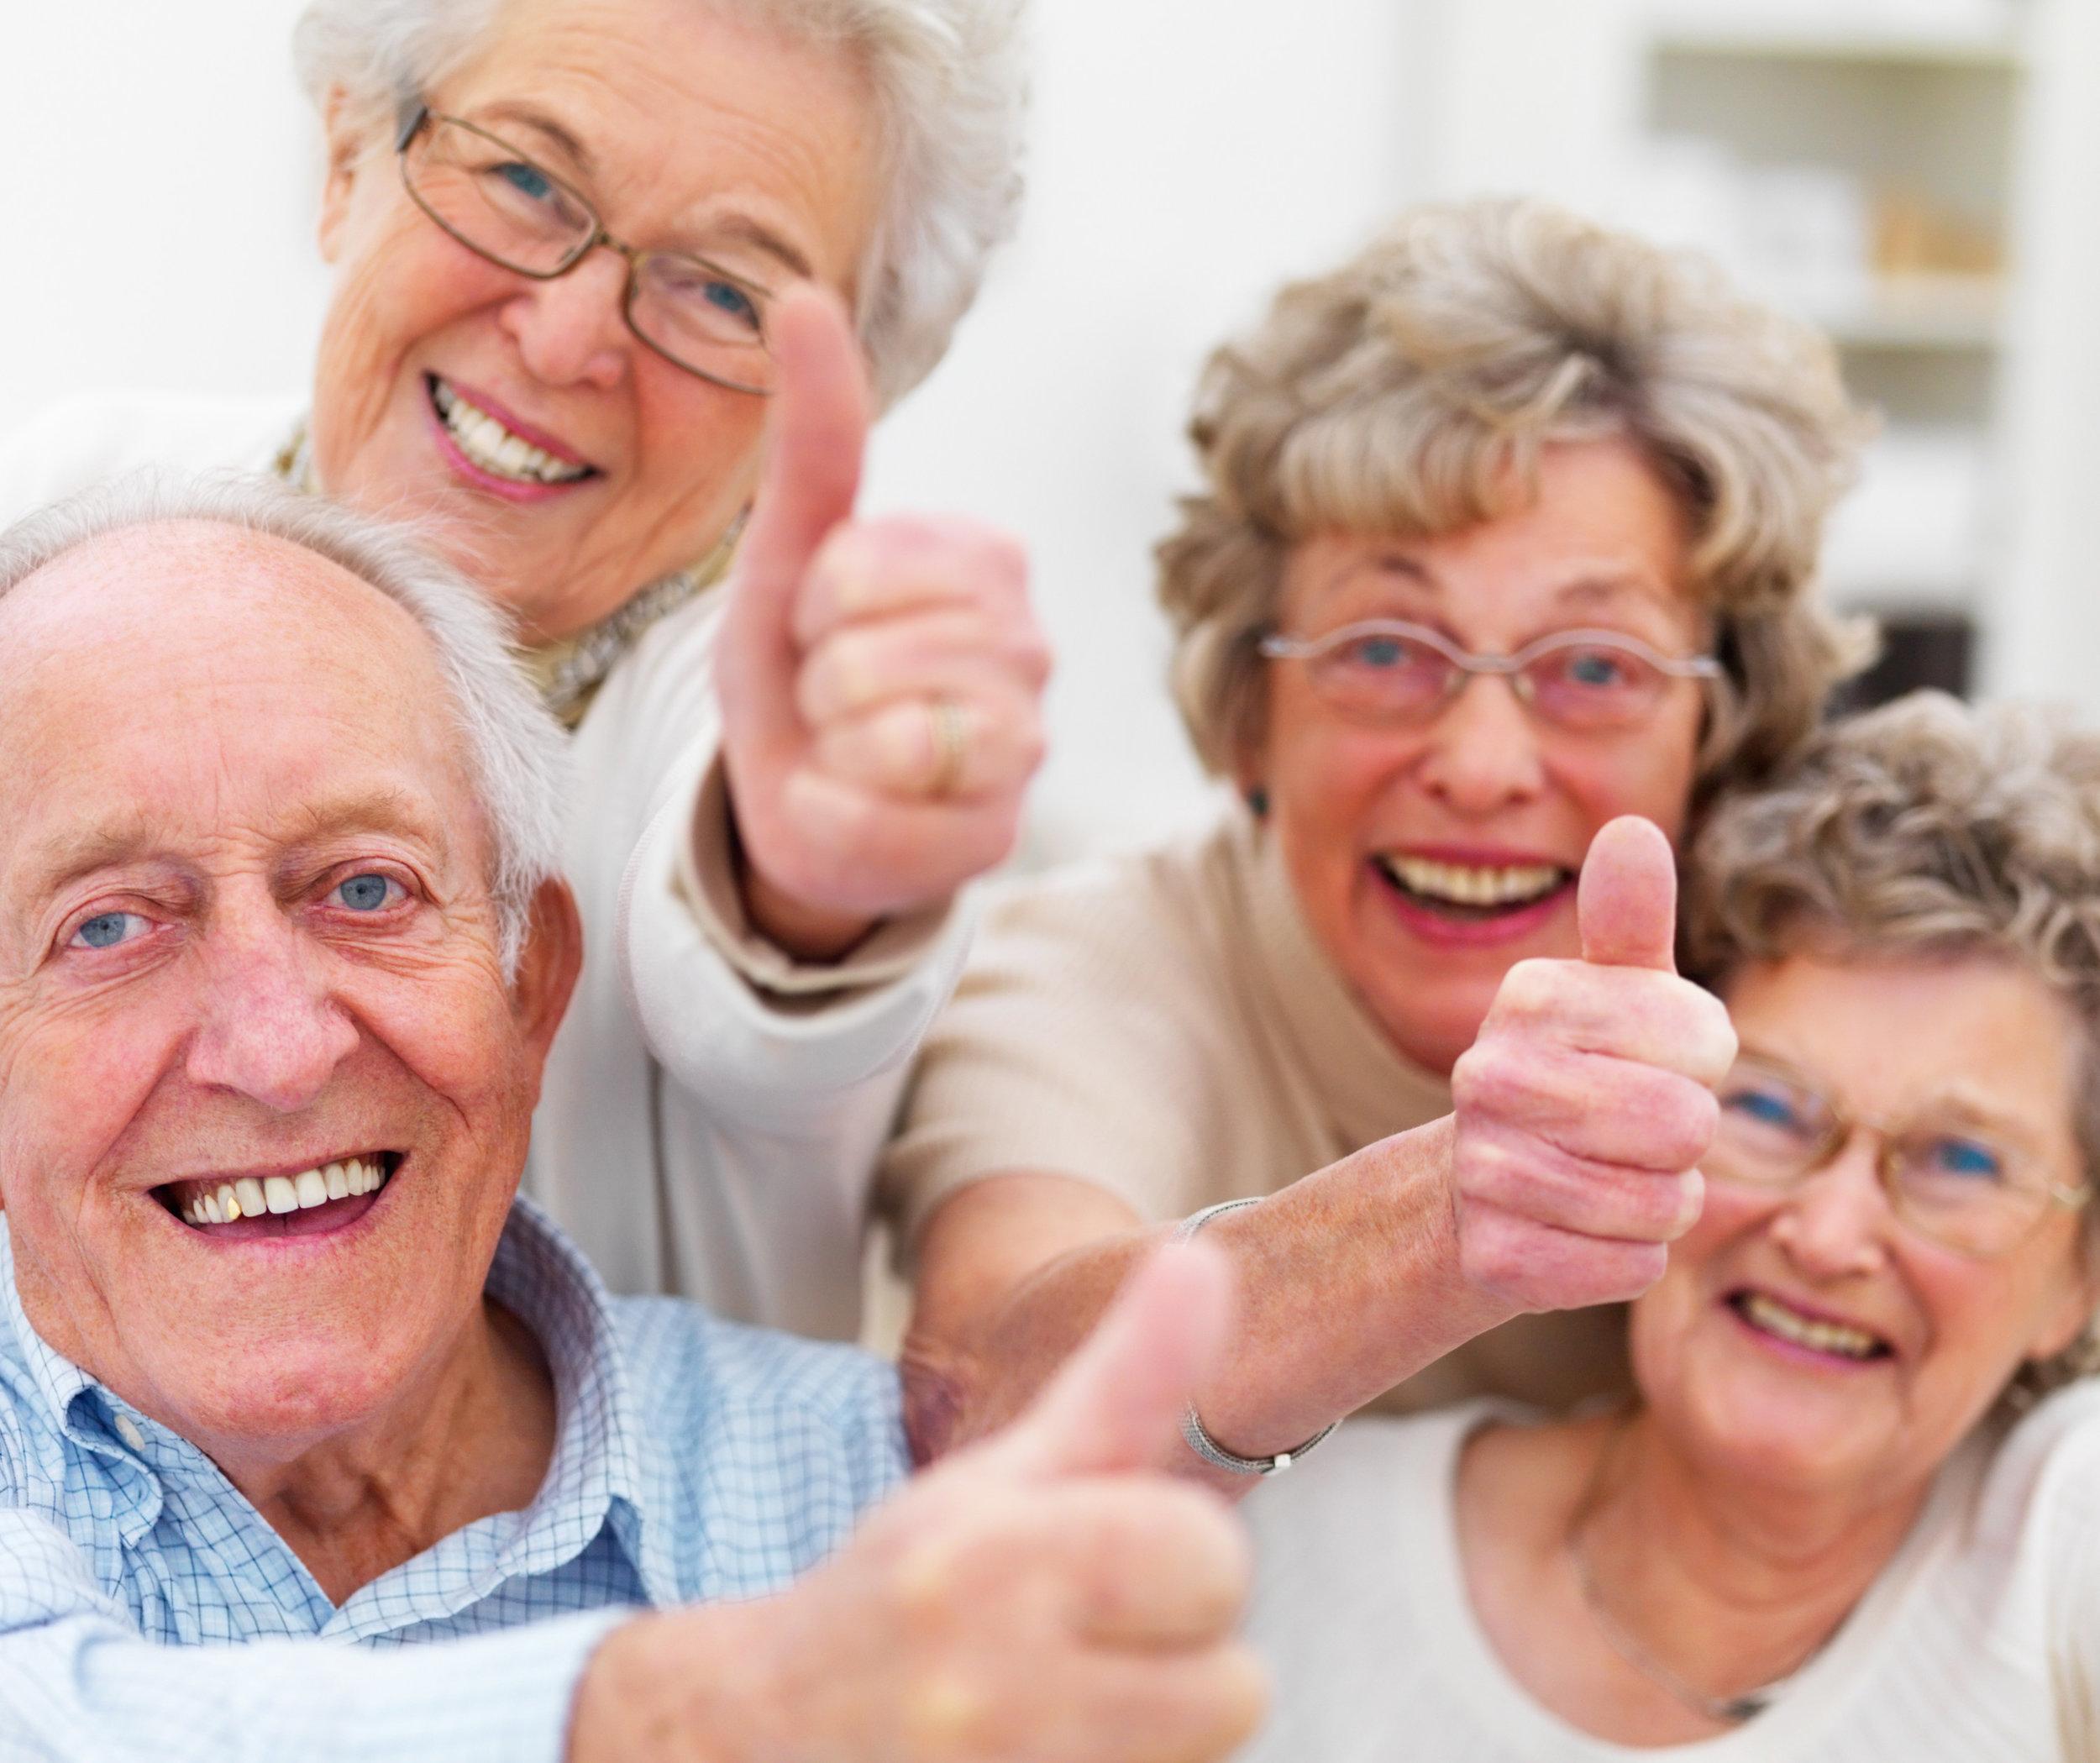 Senior & Veteran Discounts Available on Plumbing, Heatnig & AC Services